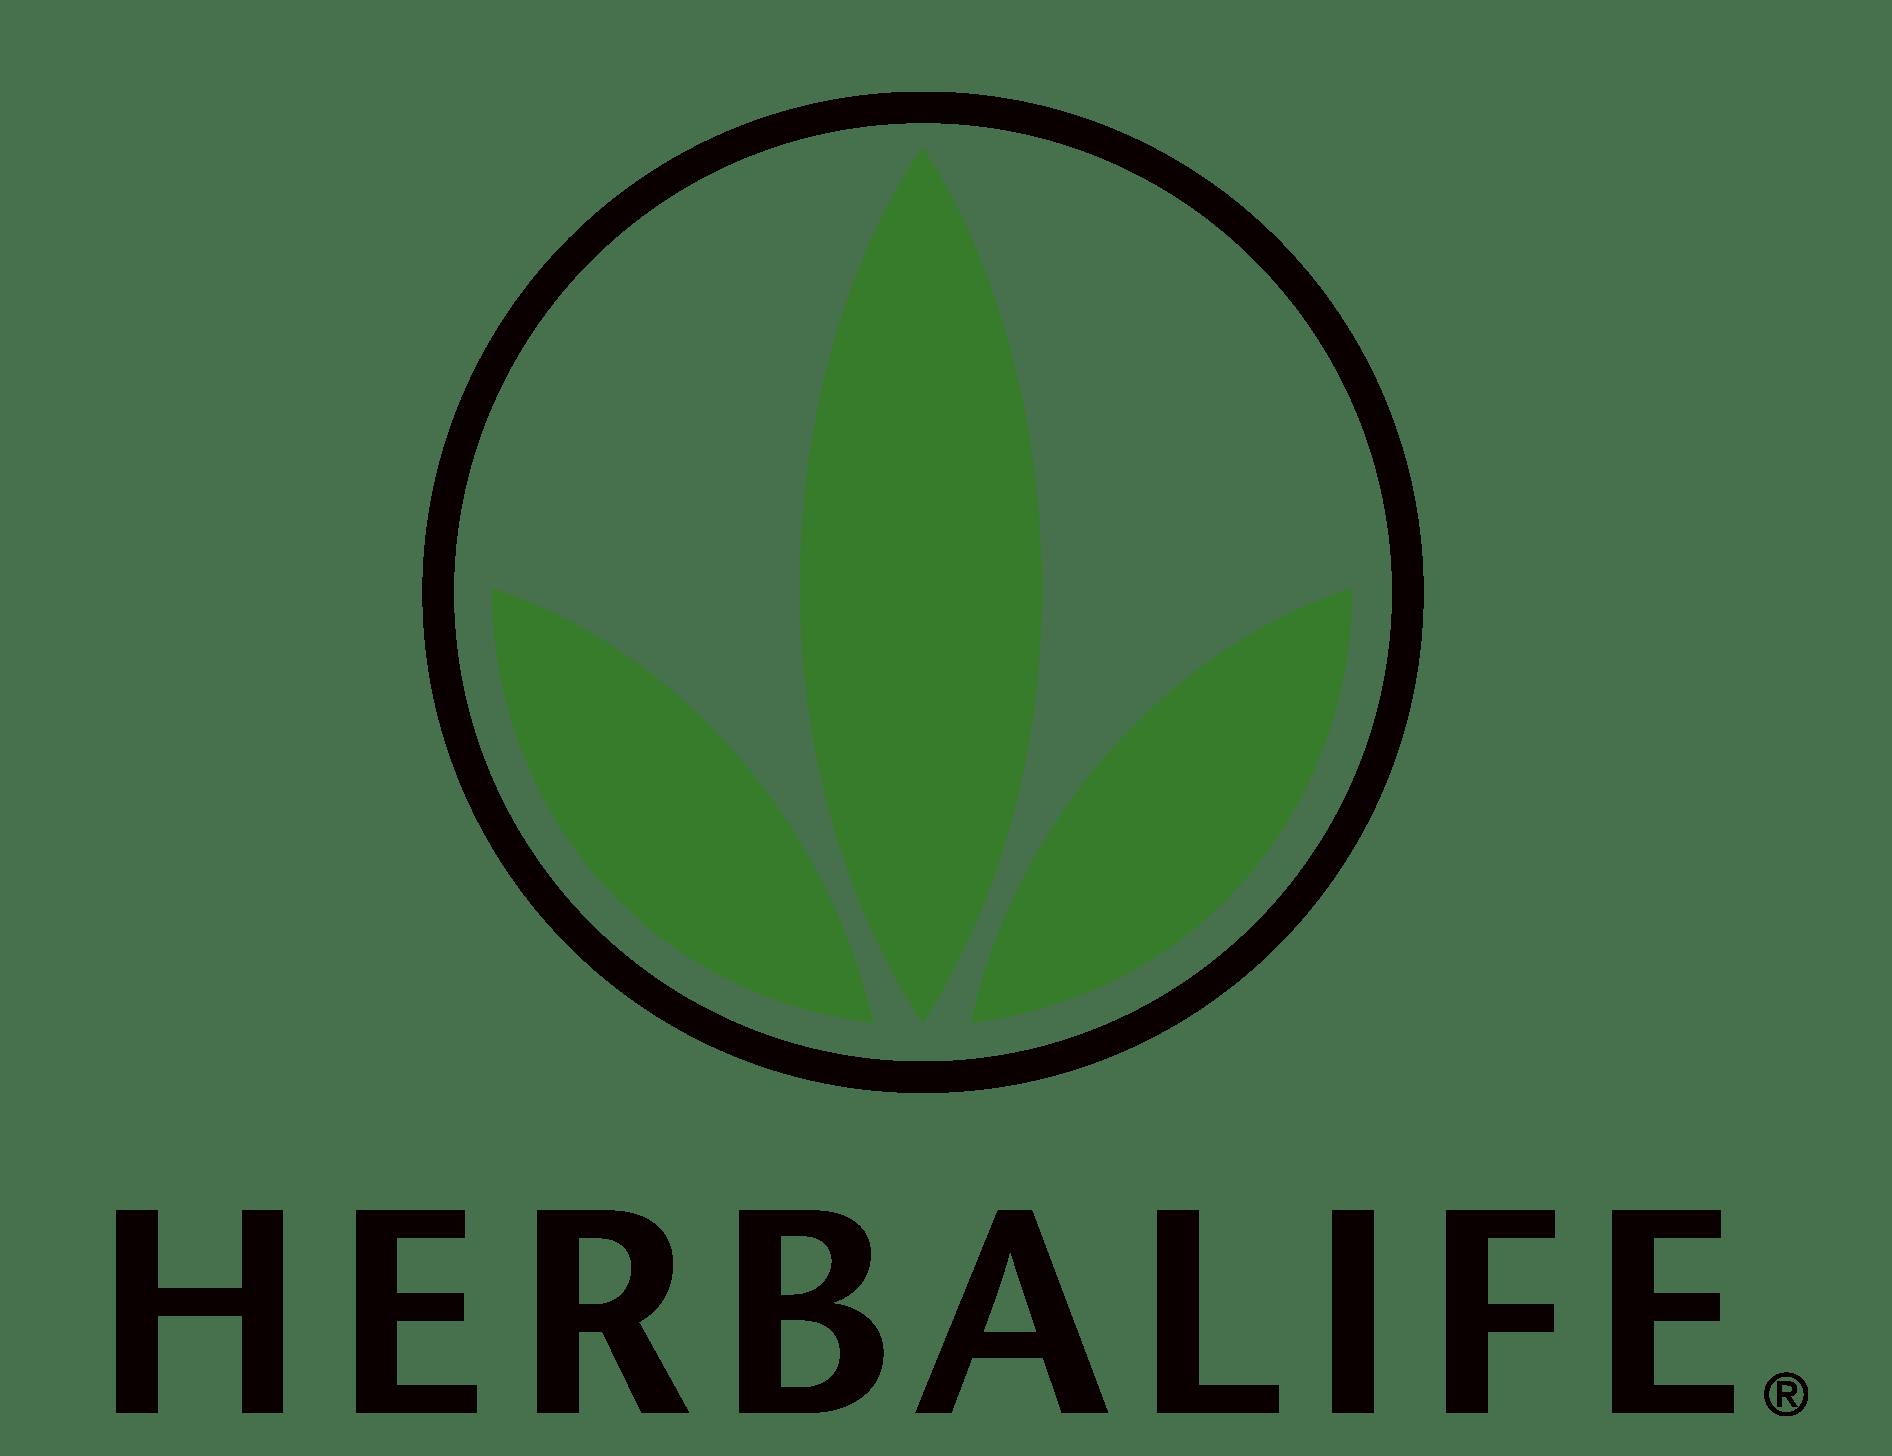 Herbalife India partners with Global Health Strategies